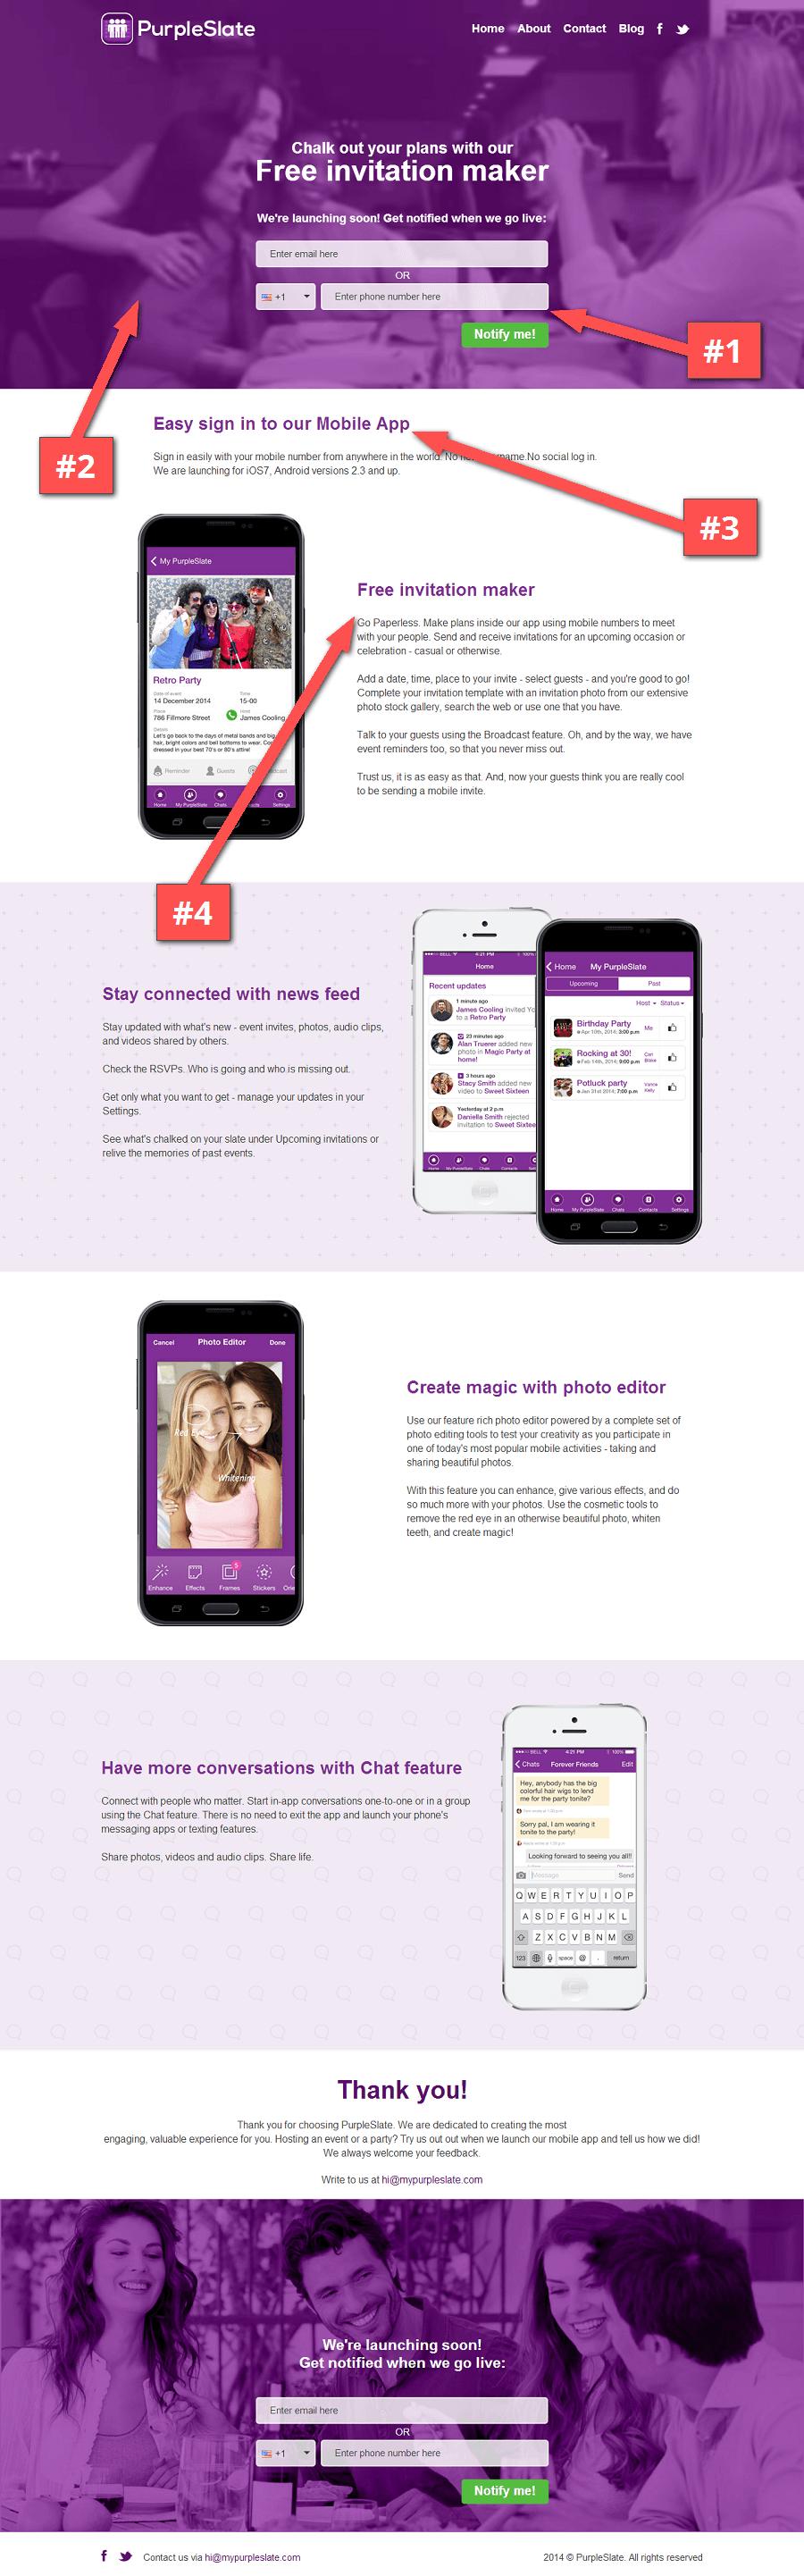 PurpleSlate_I_Free_invitation_maker_-_www_mypurpleslate_com